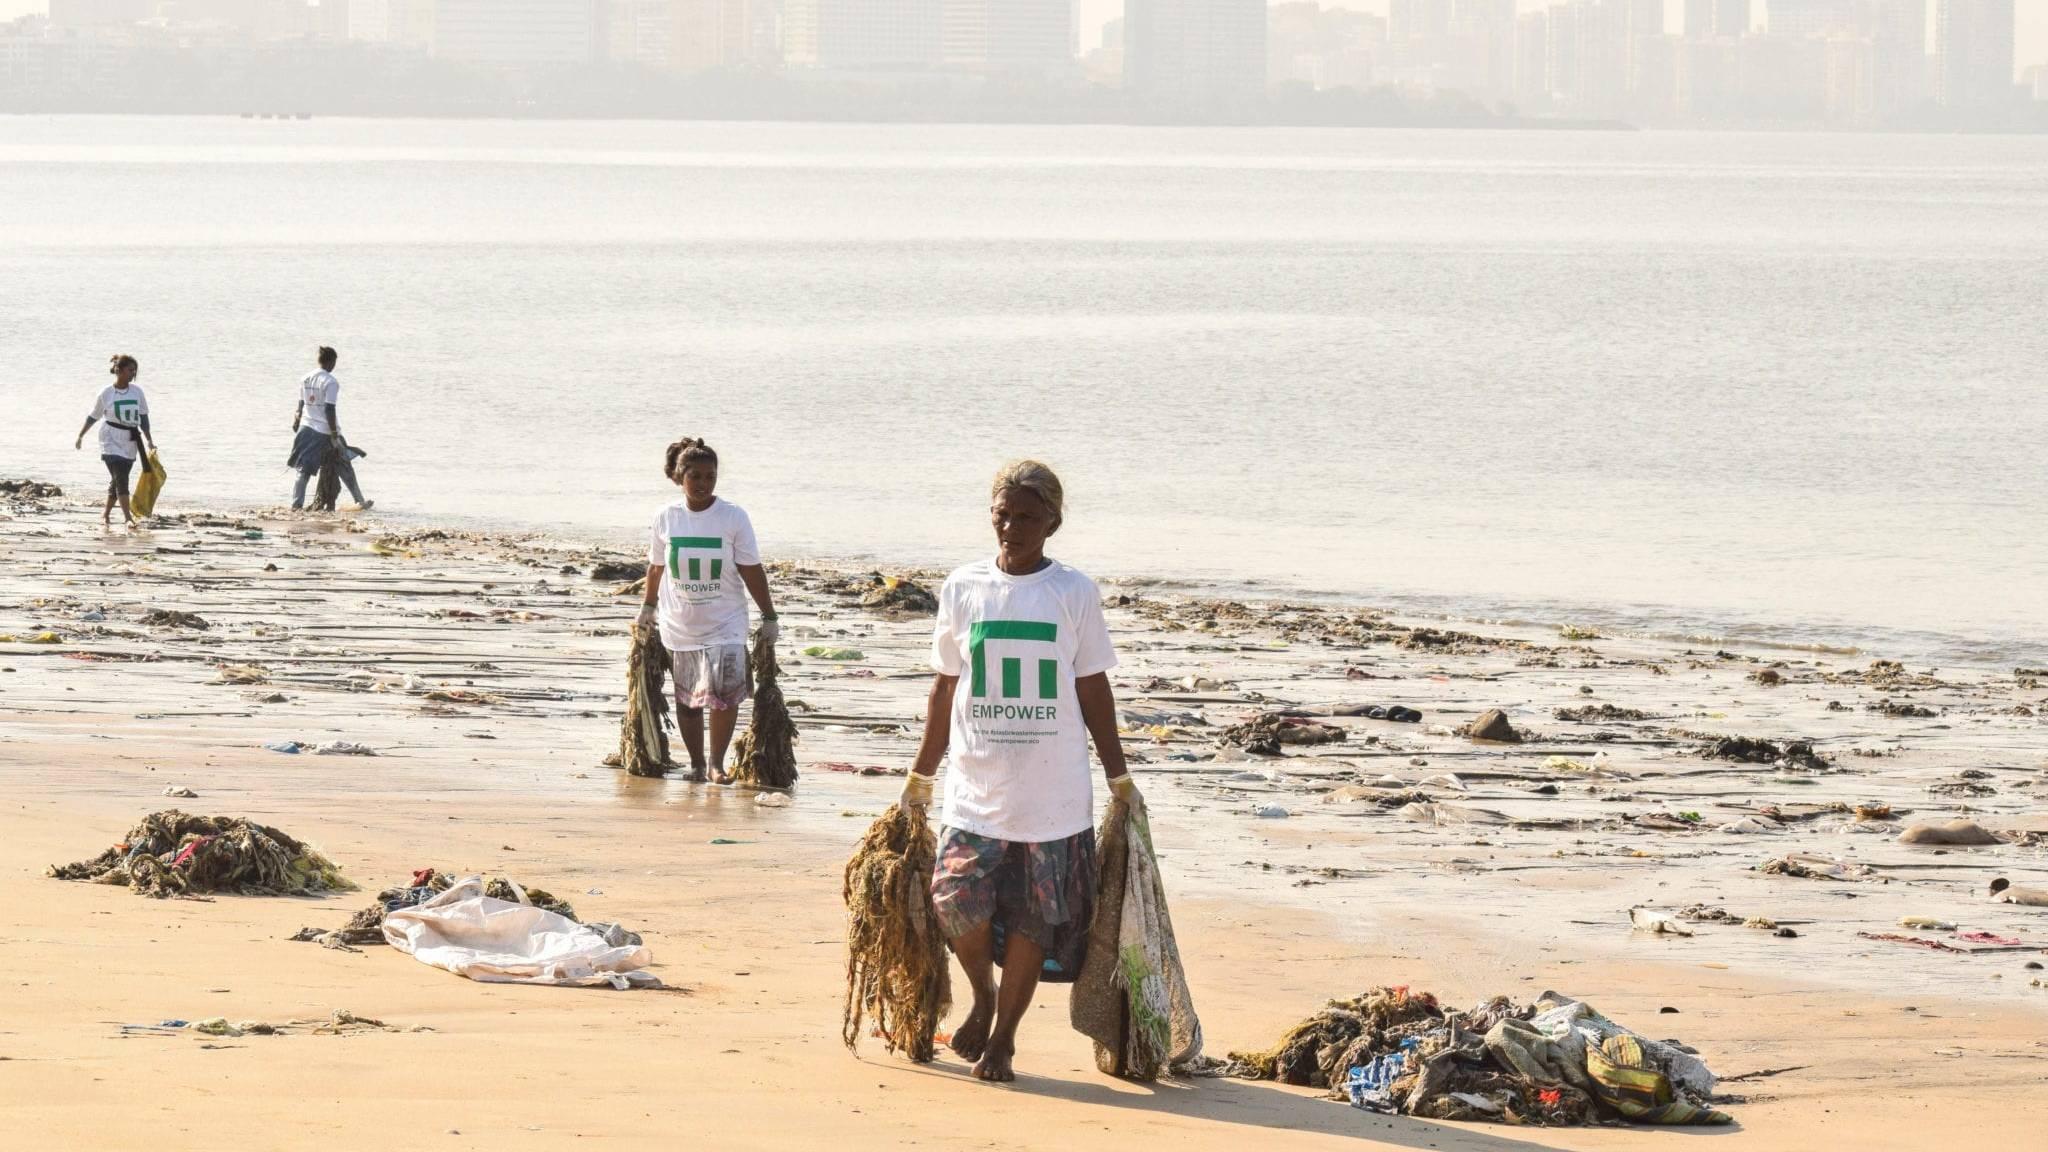 Empower cleanup with Bija and Sunflower welfare foundation. Chowpatty beach, Mumbai, India.